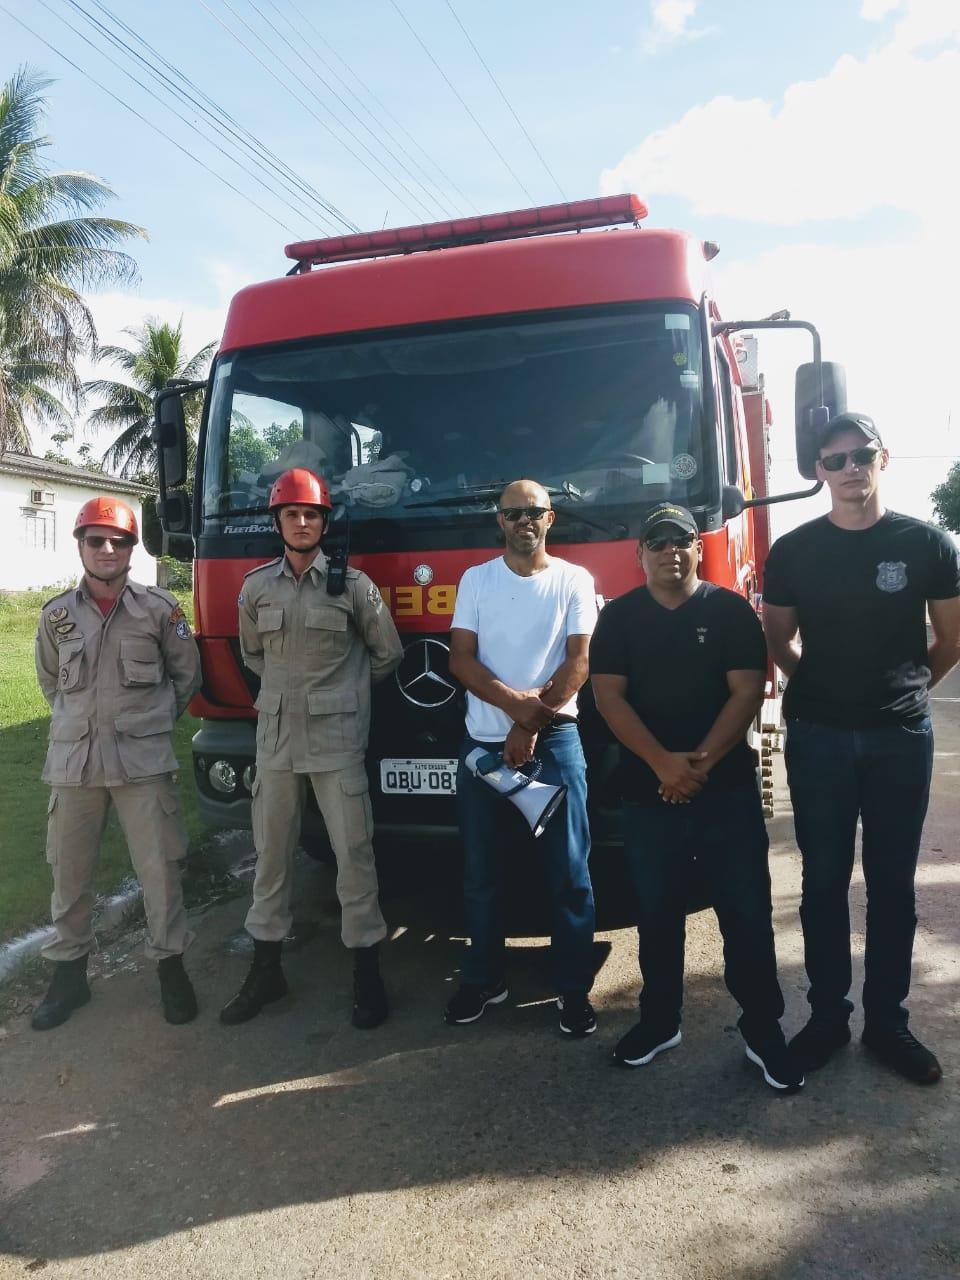 Equipe do Corpo de Bombeiros e Polícia Civil evitou suicídio